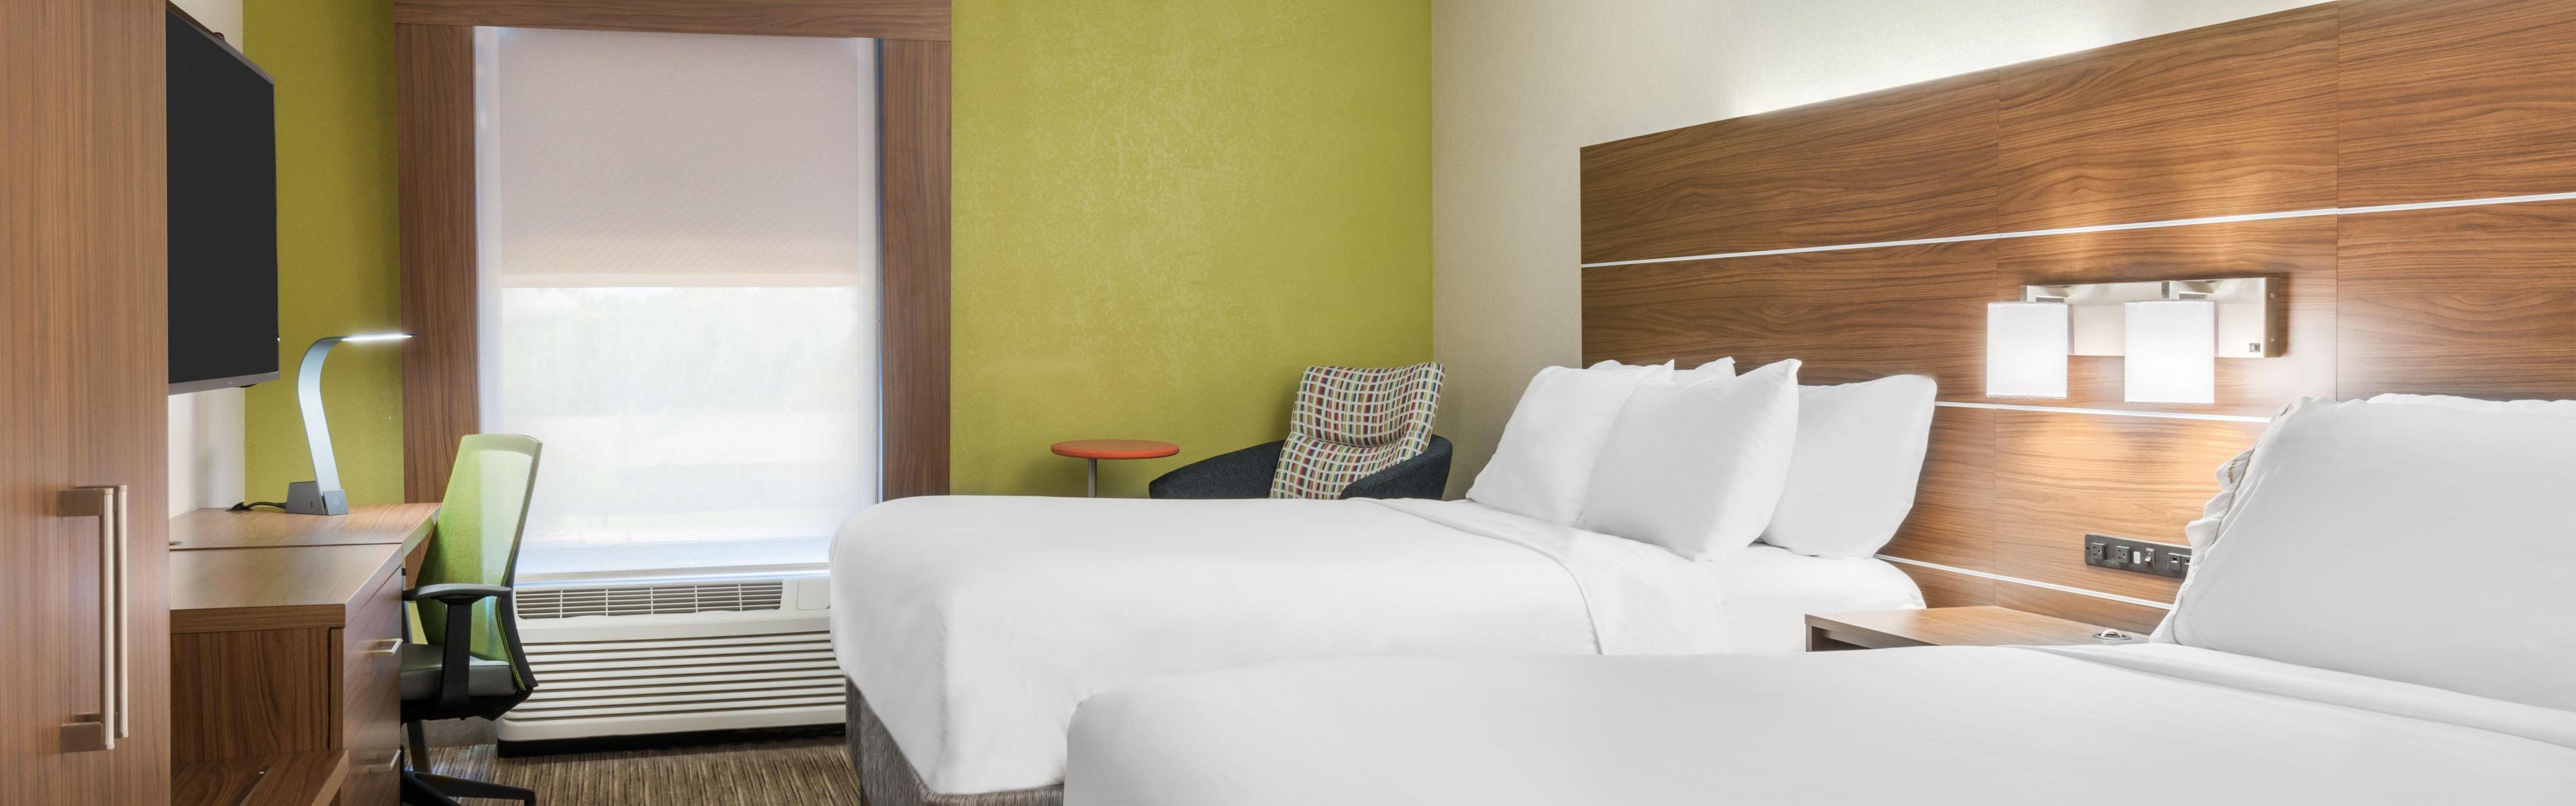 Holiday Inn Express Bentonville image 1